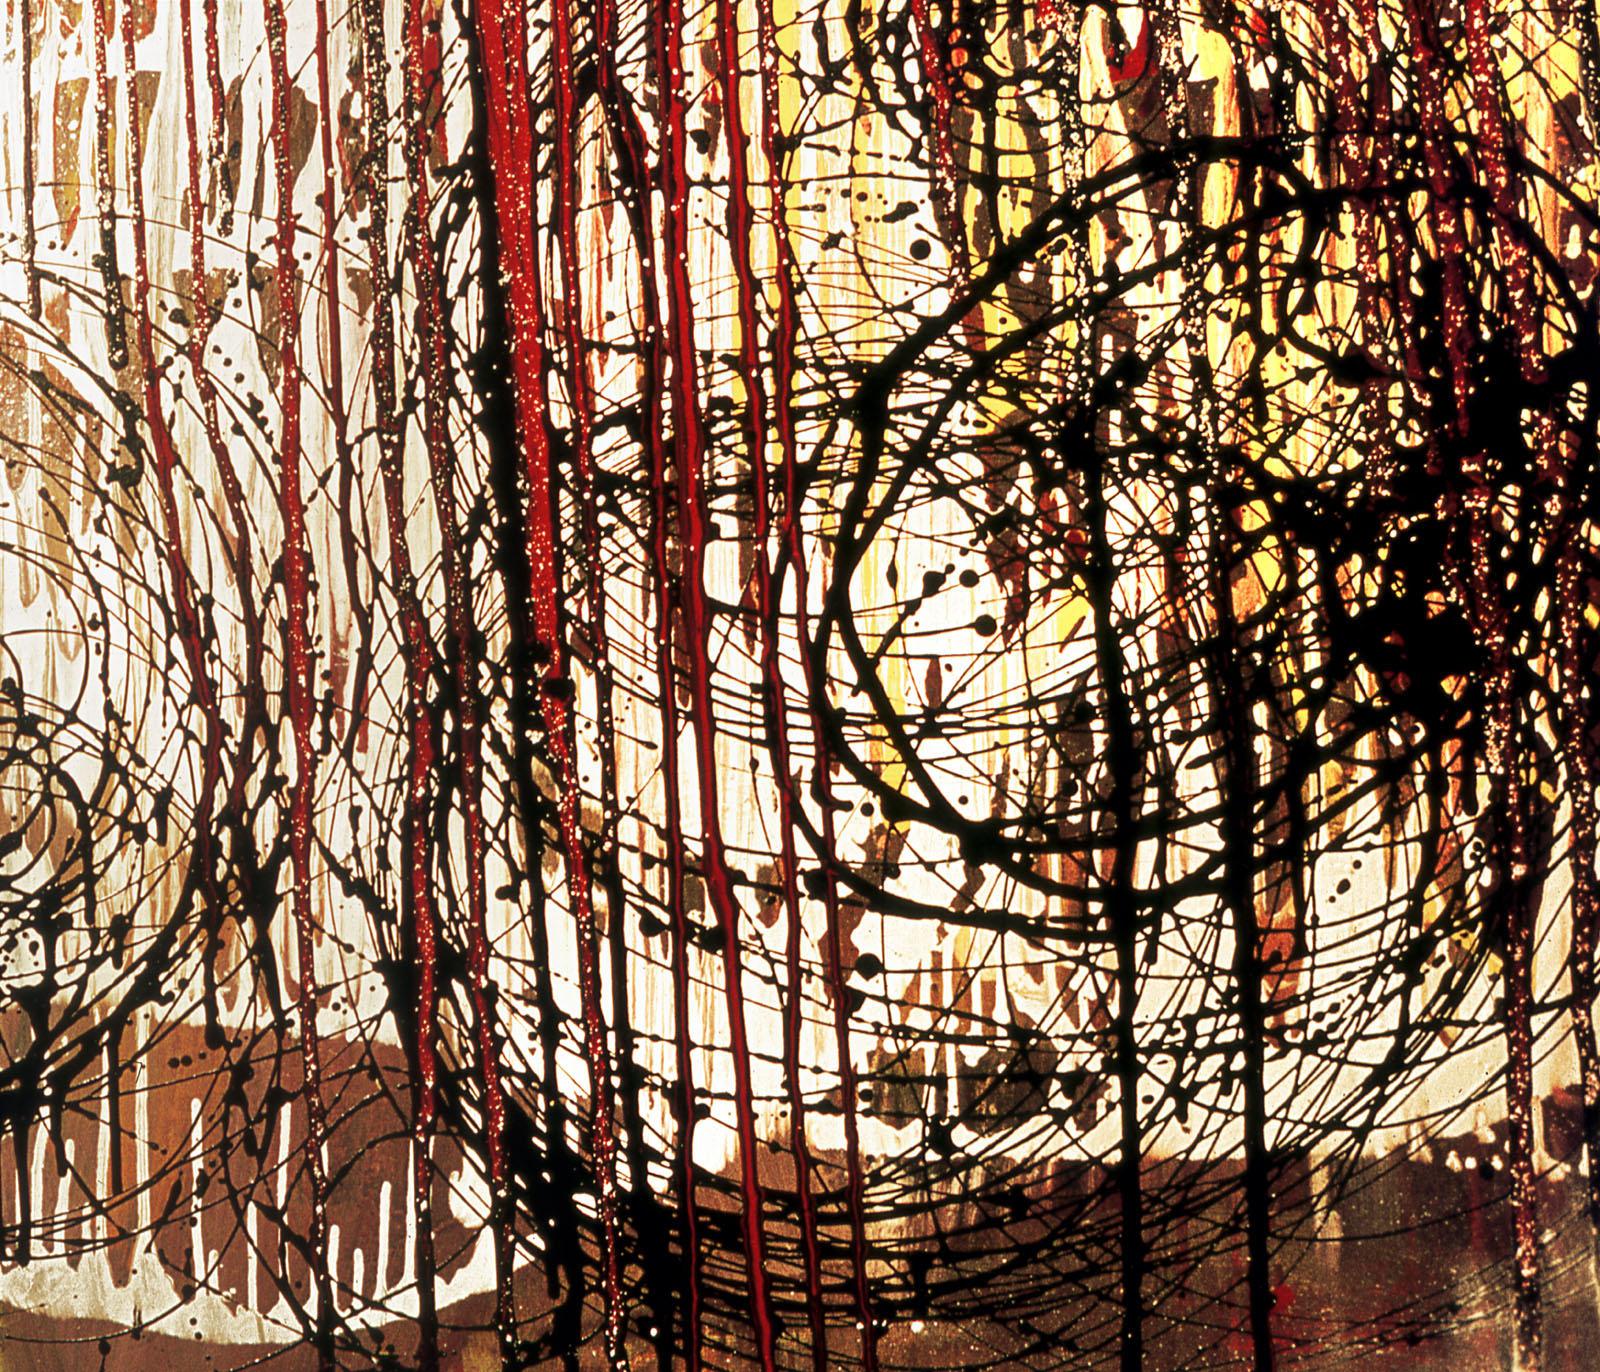 panies-danielvillalobos-spanish-painting-abstractexpressionism-12